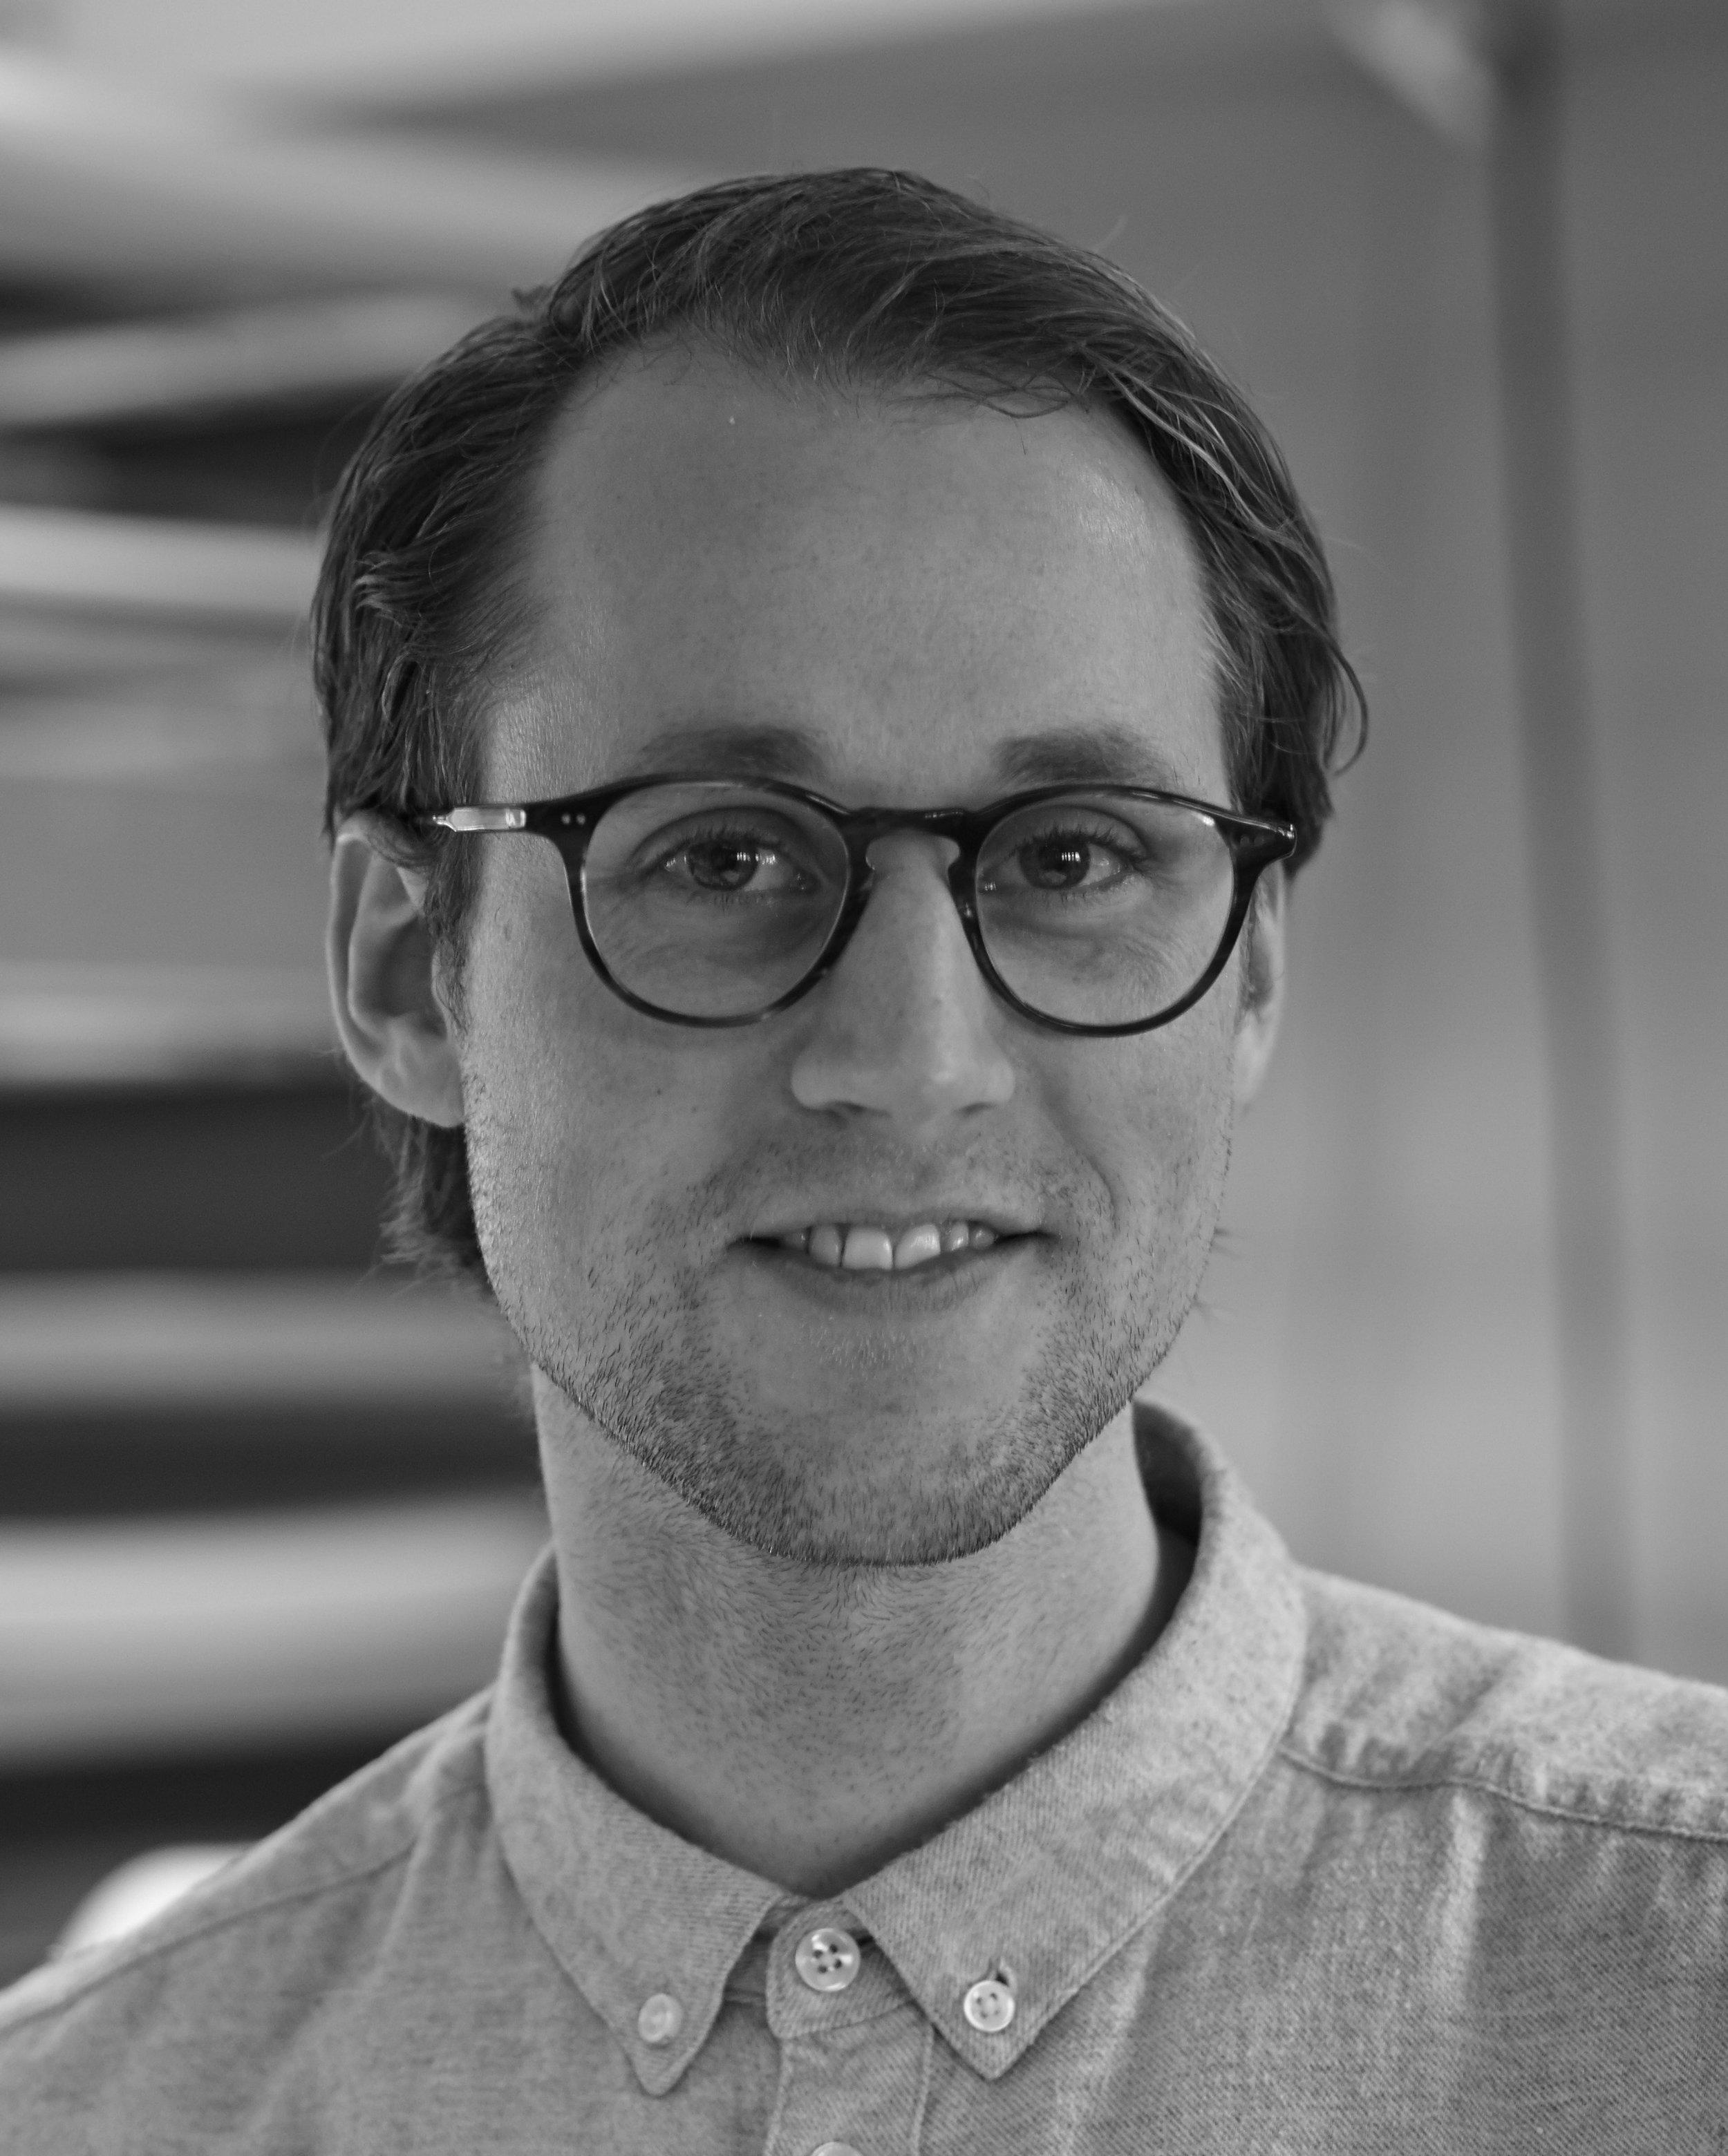 Architect Børge Raknes